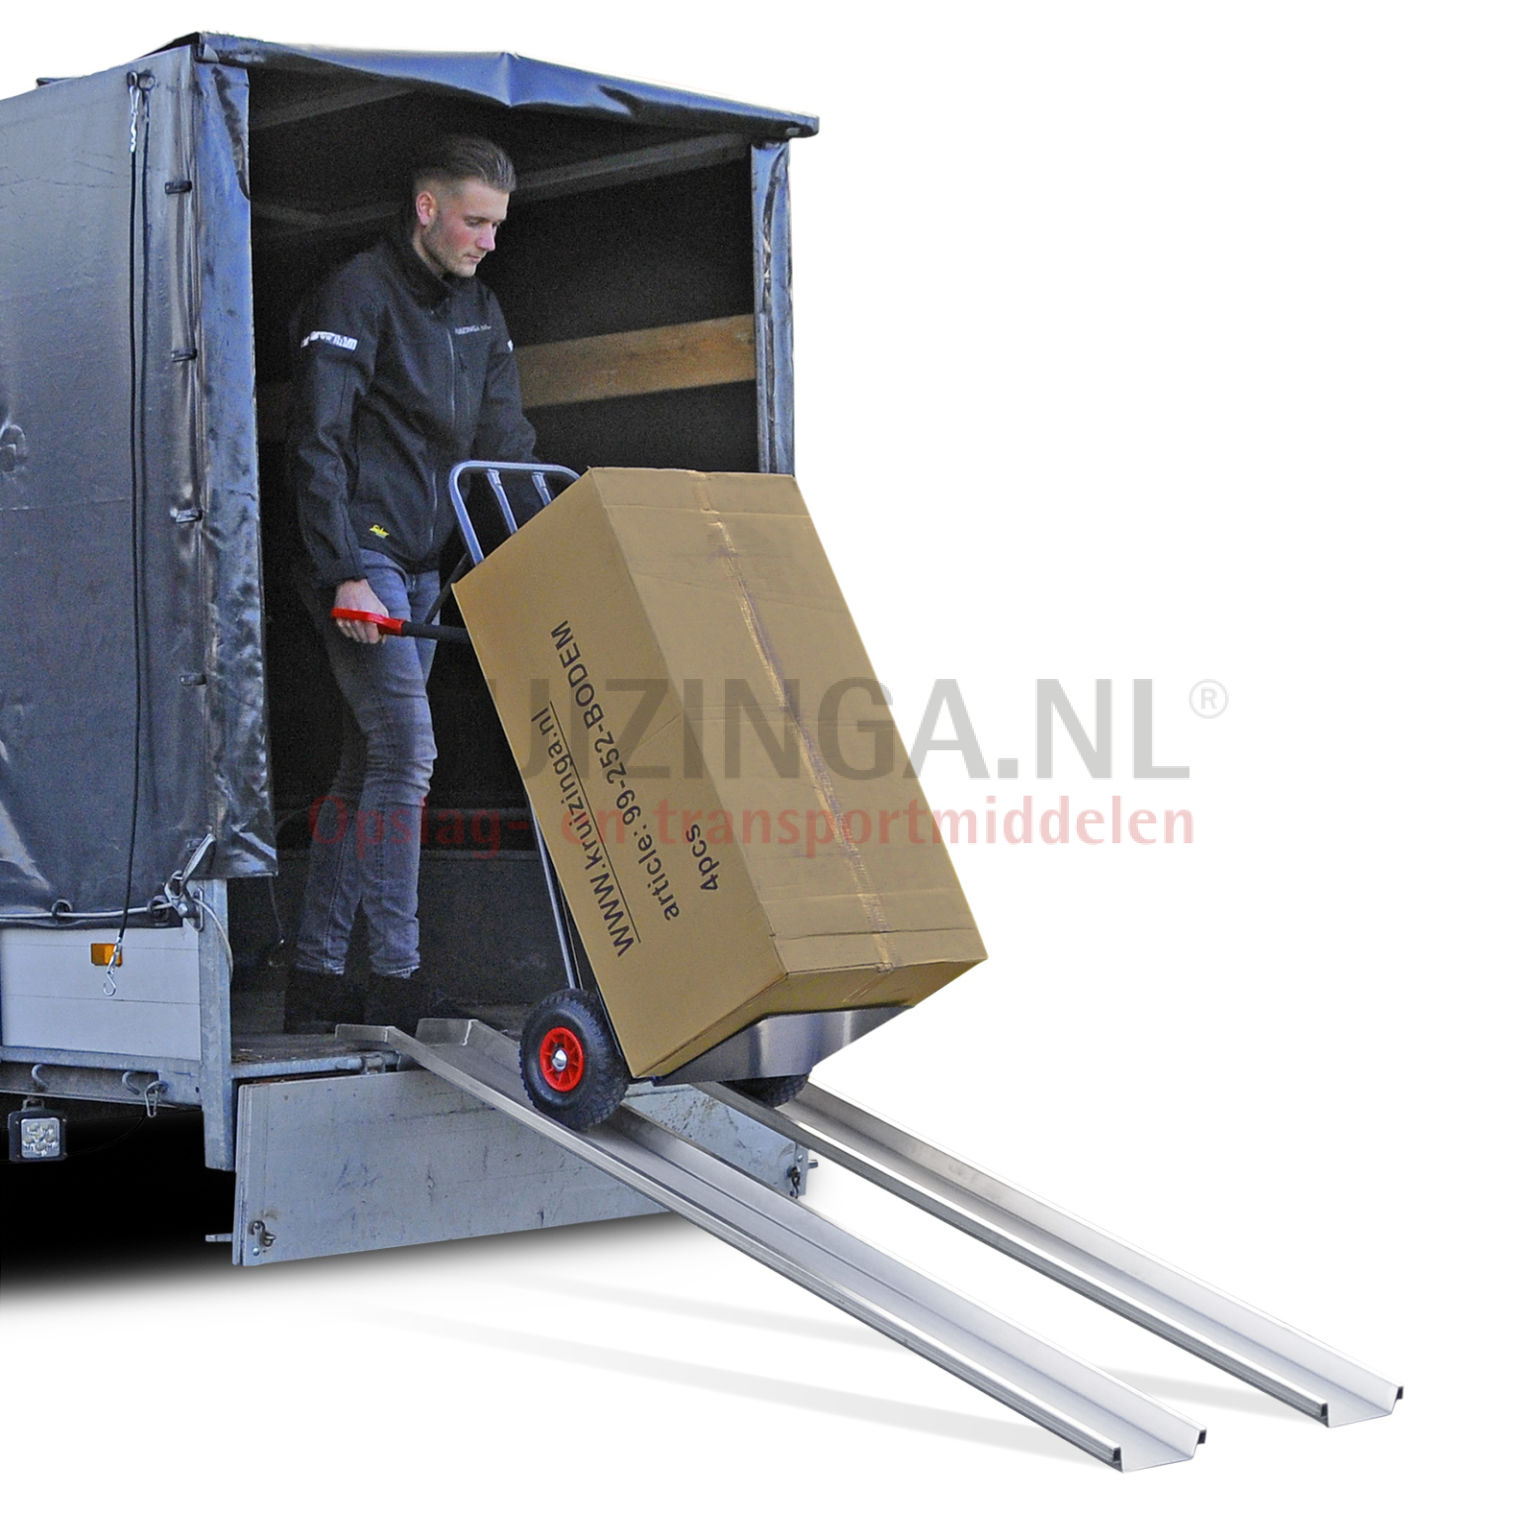 verladeschienen auffahrrampen auffahrrampe aluminium 250 cm satz 242 50 frei haus. Black Bedroom Furniture Sets. Home Design Ideas